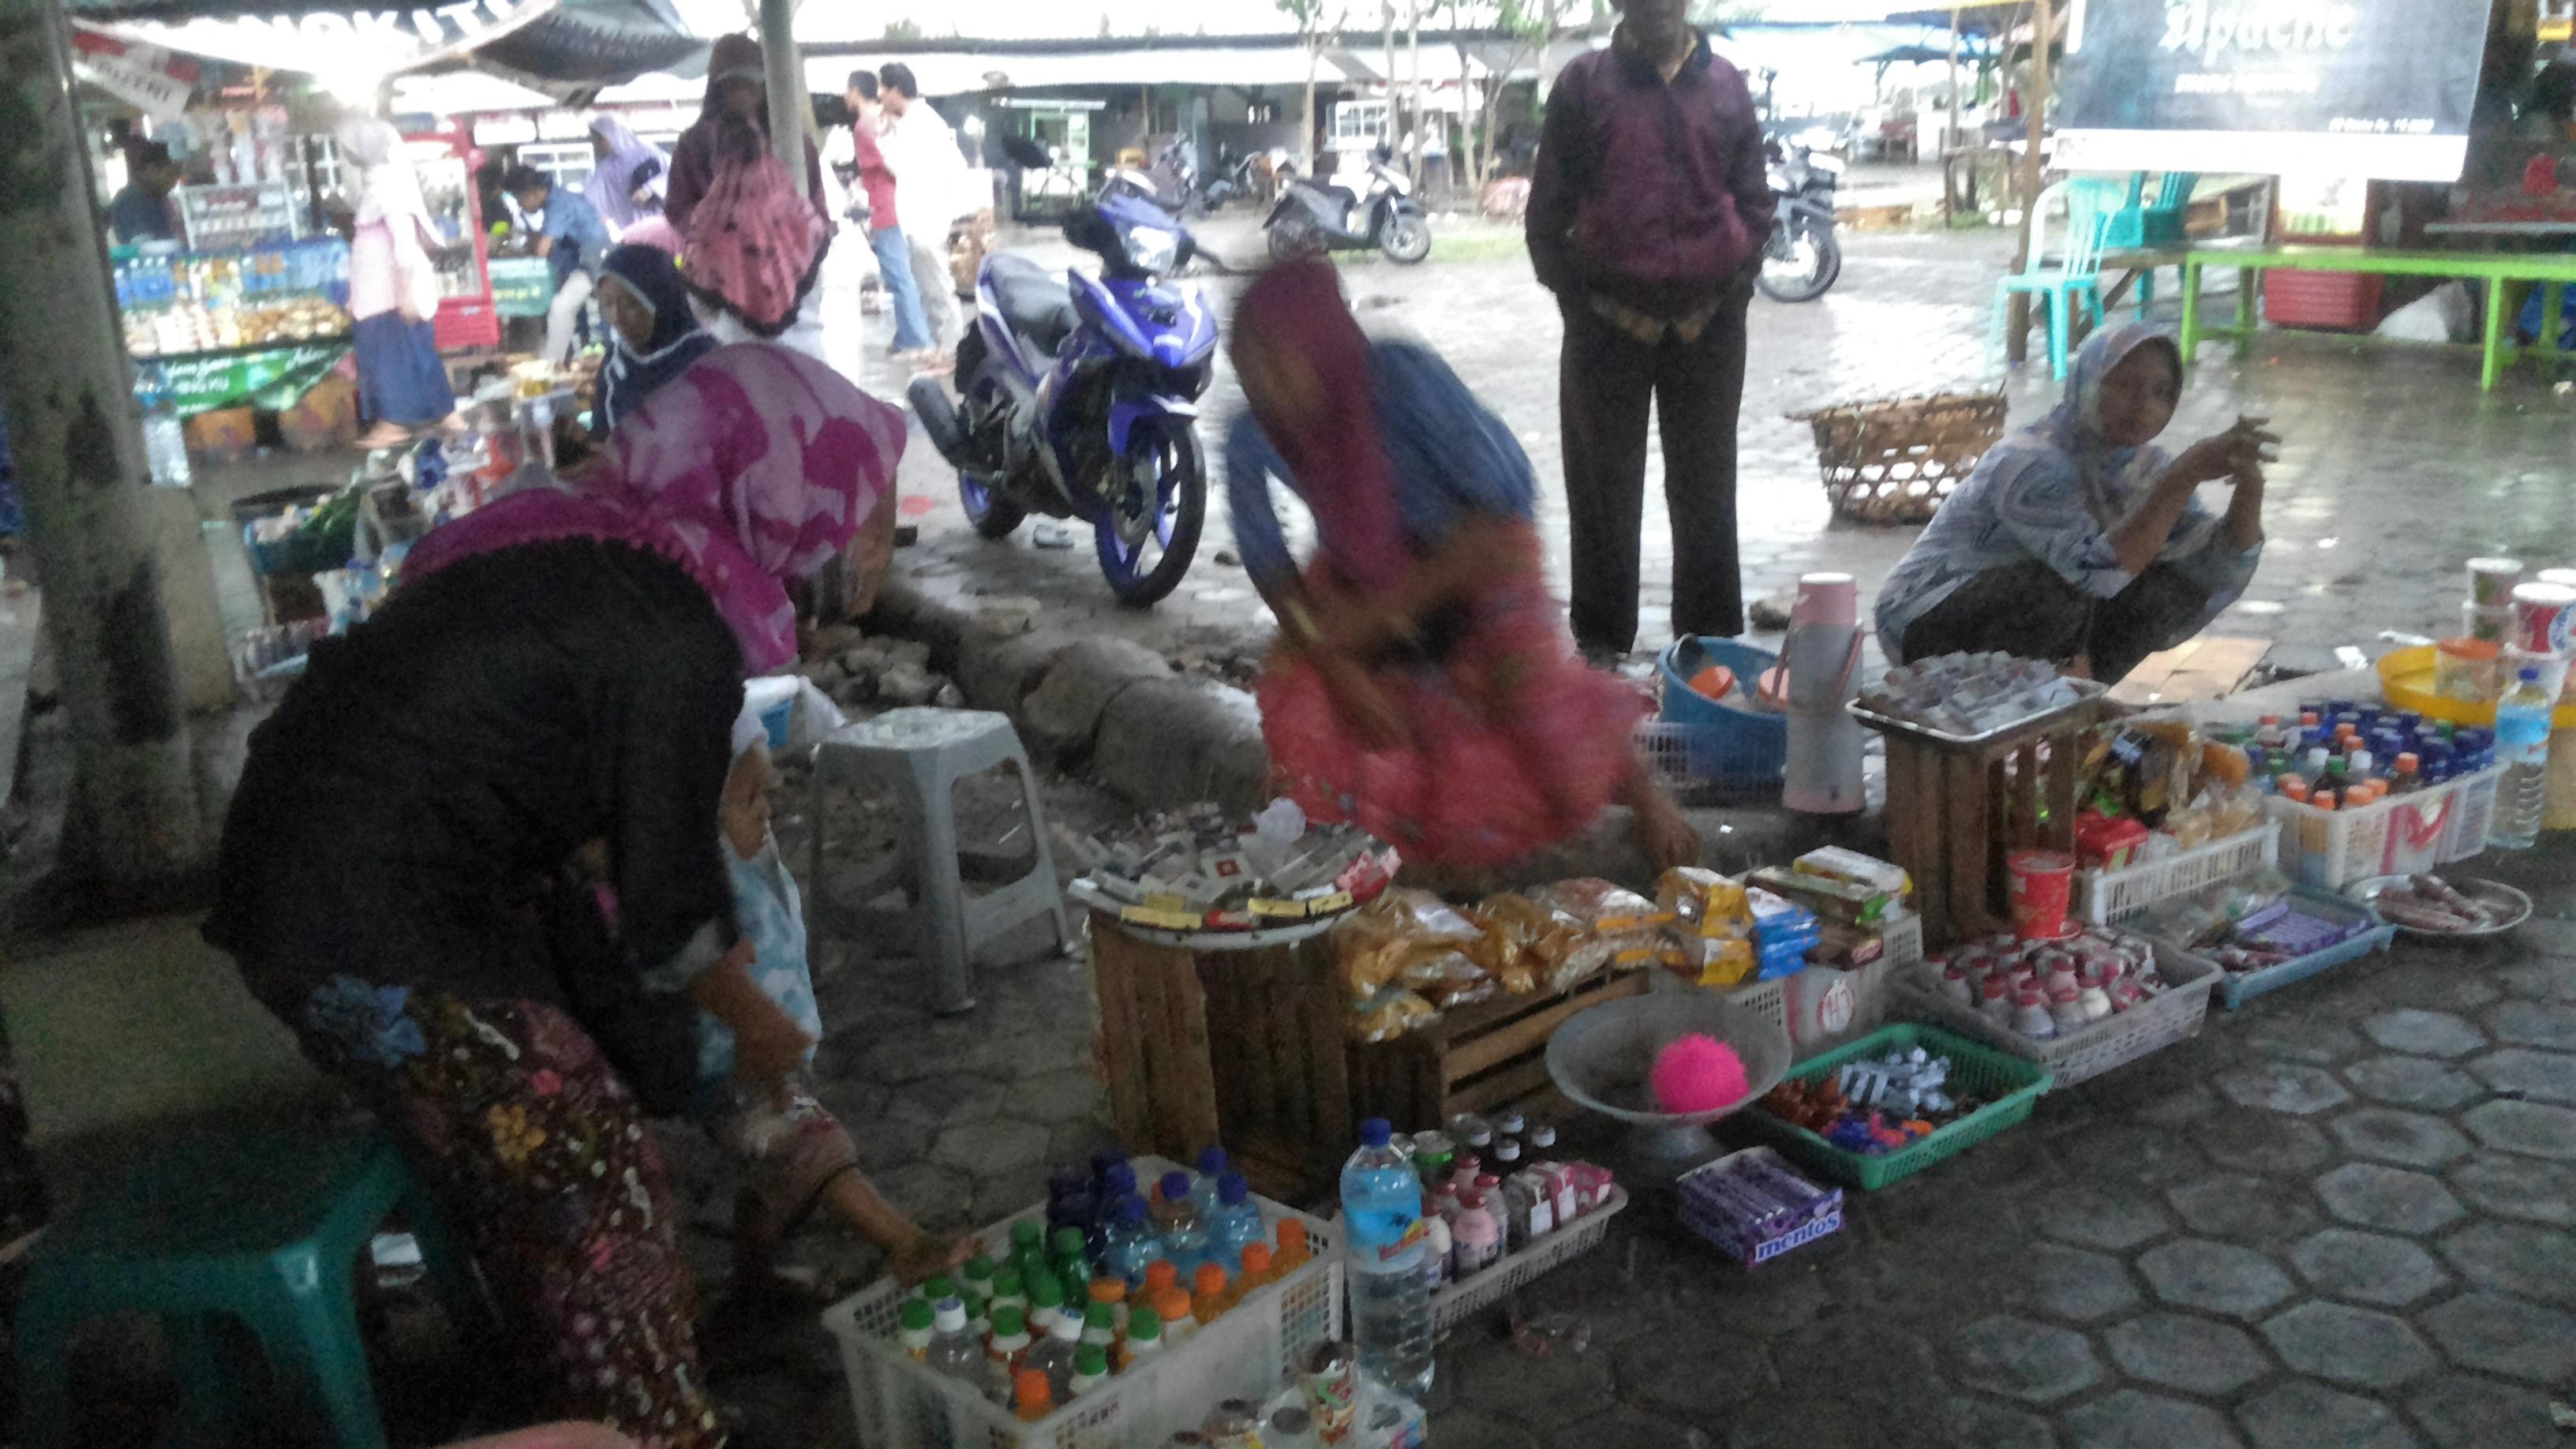 Menggelar dagangan tidak pada kios yang disediakan di Bandara Internasional Lombok.  Sumber gambar: koleksi pribadi